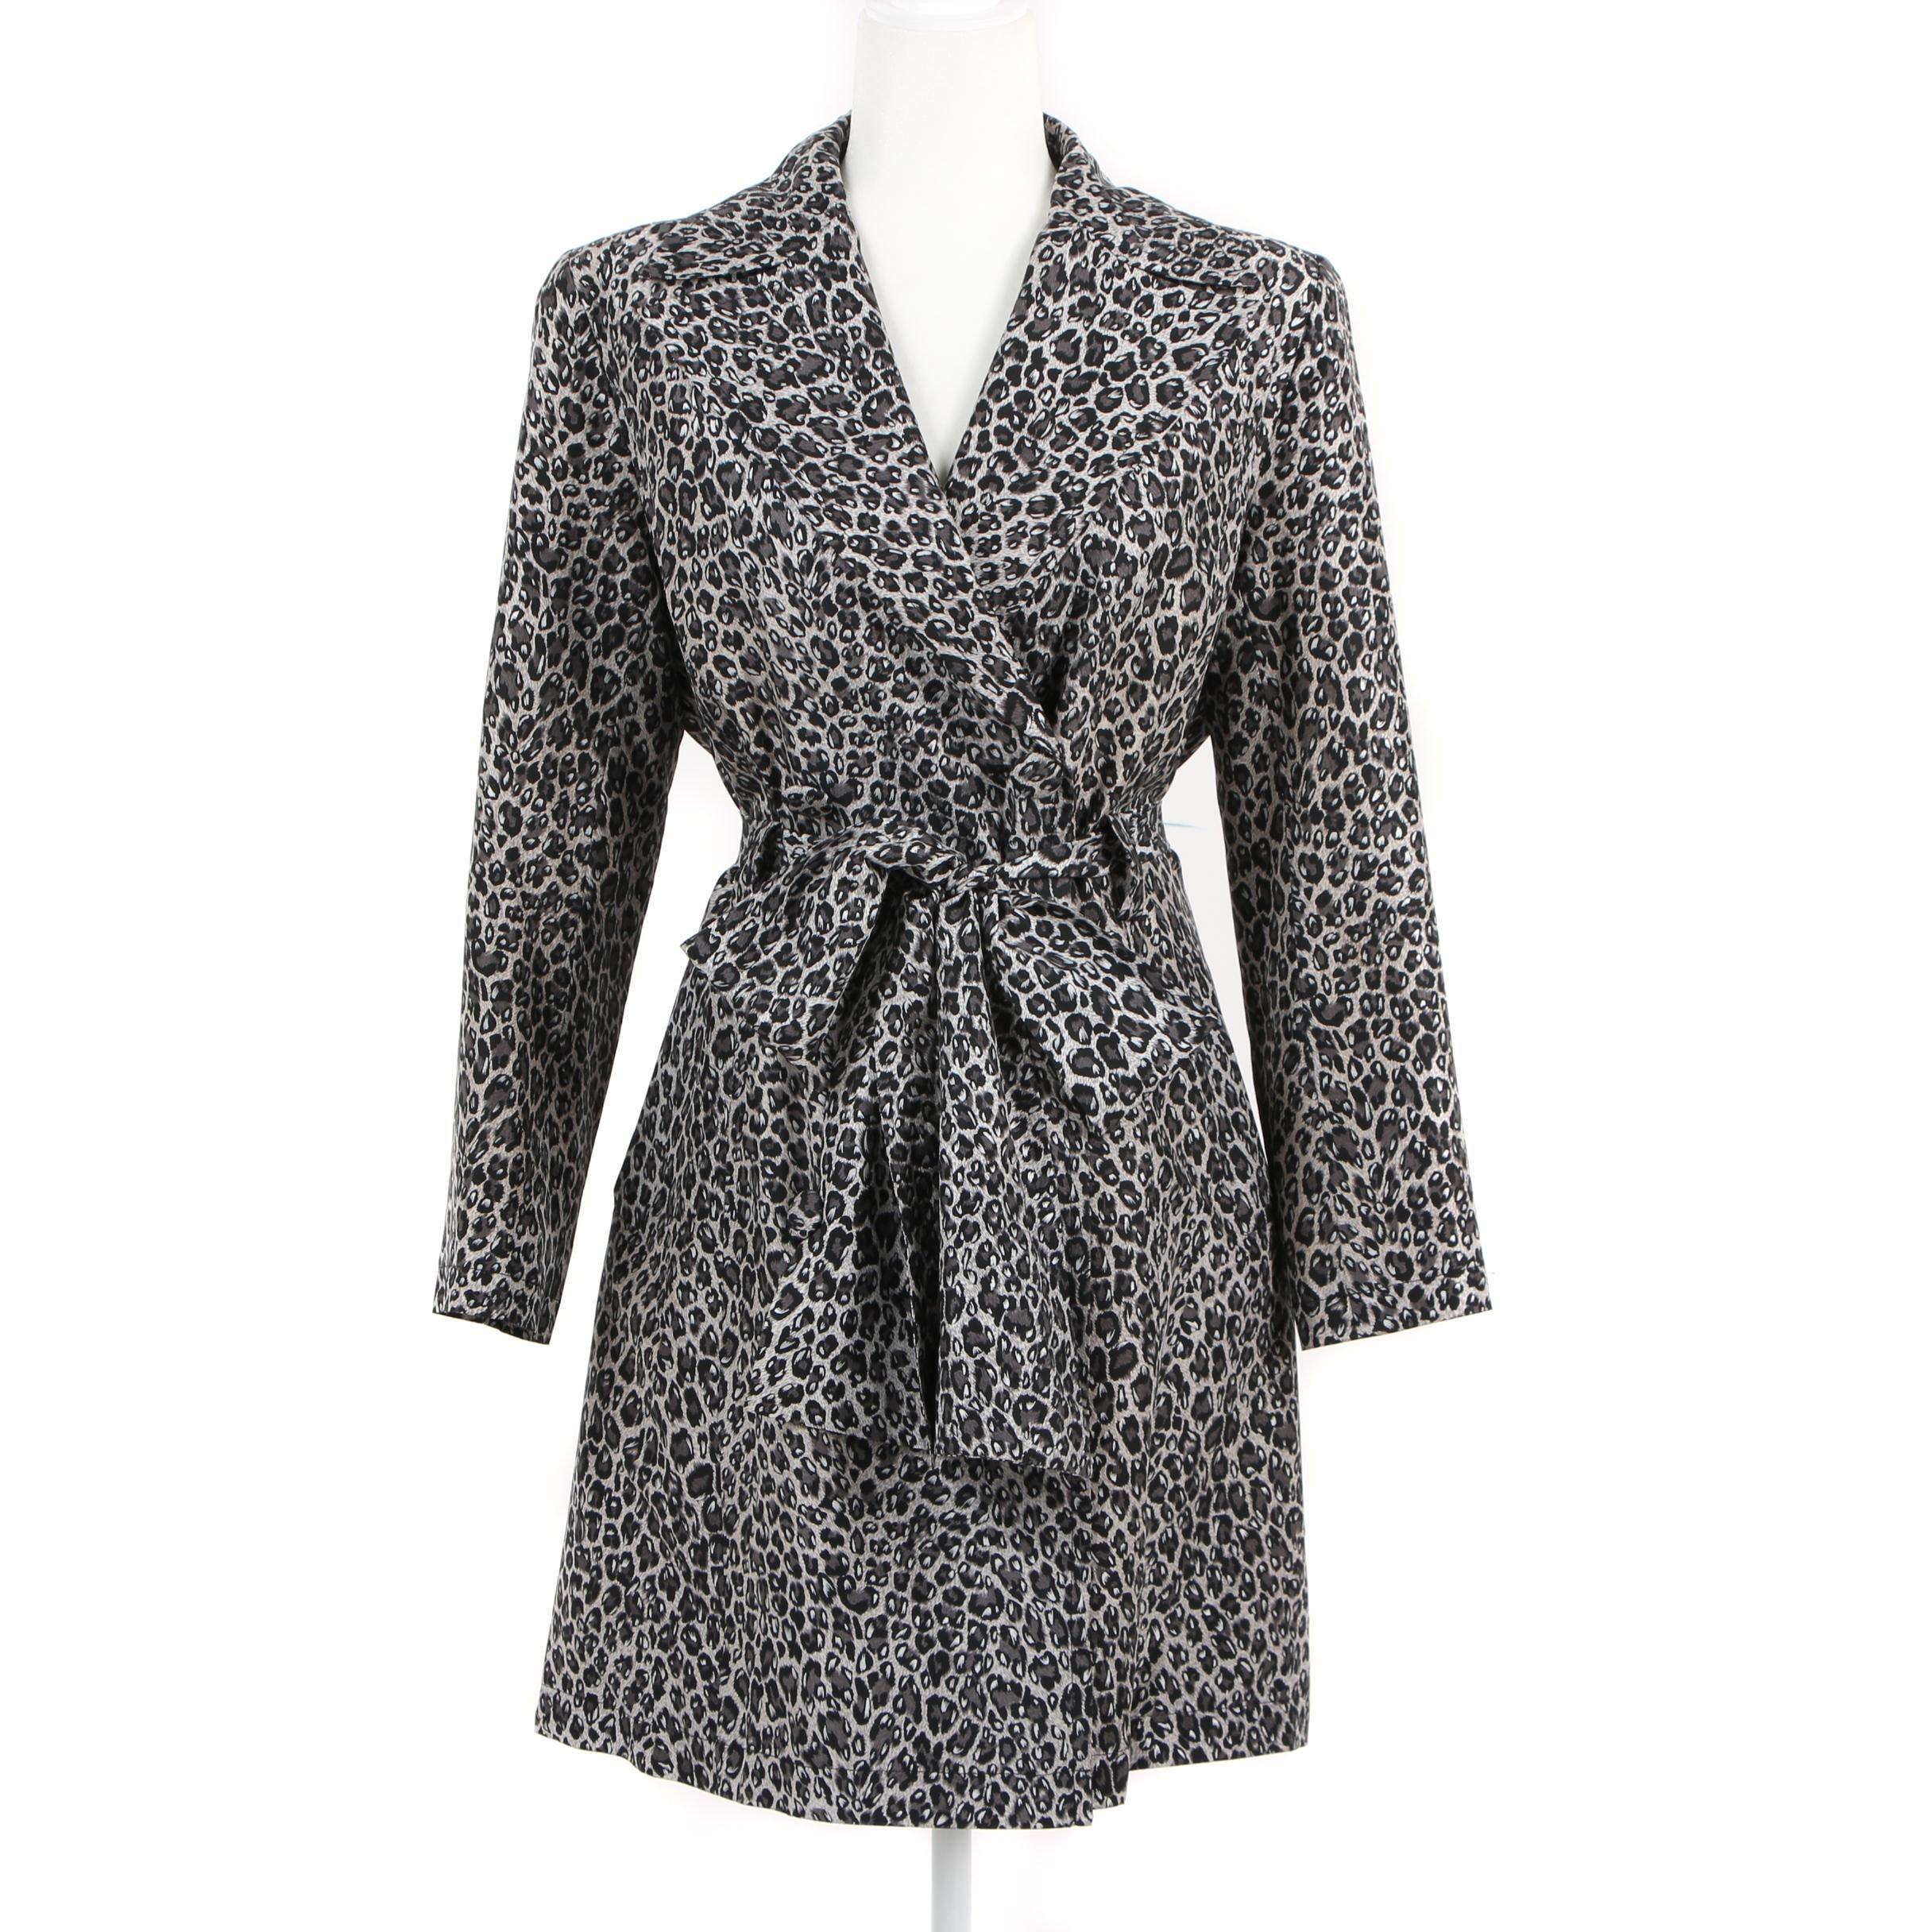 Adrienne Landau Leopard Print Silk Coat with Tie Sash